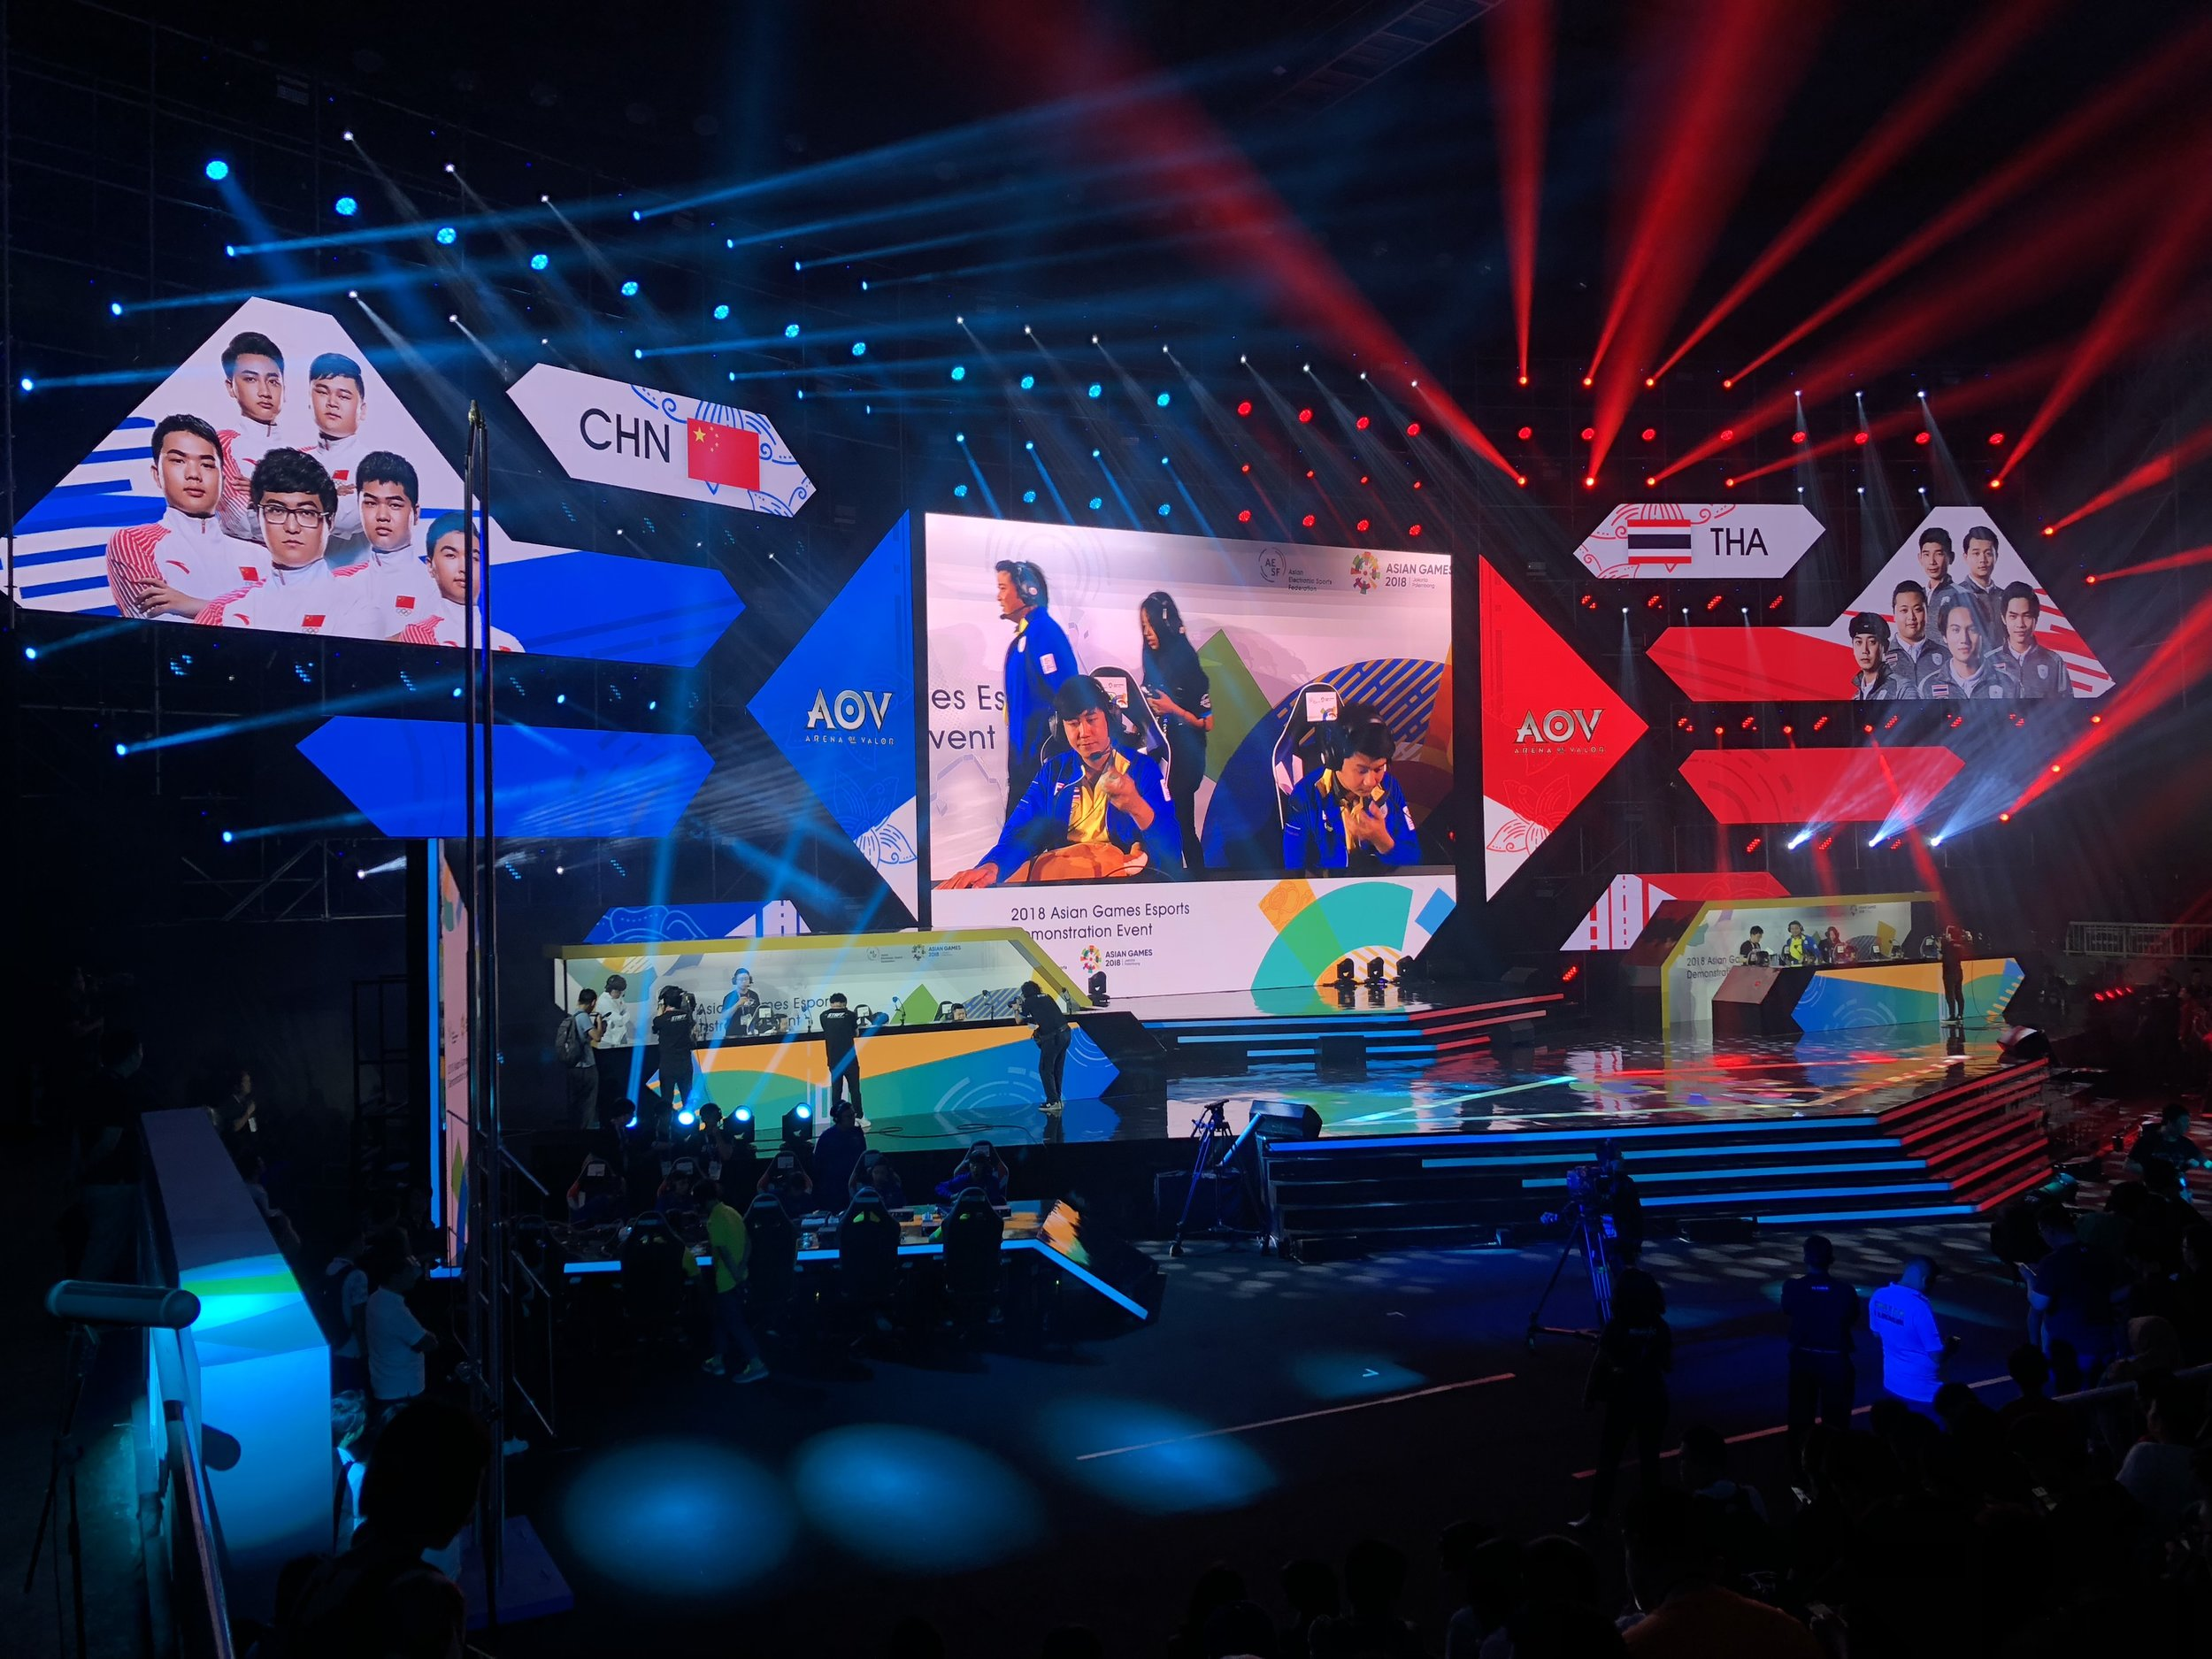 China and Thailand squaring off in AOV at Britama Arena